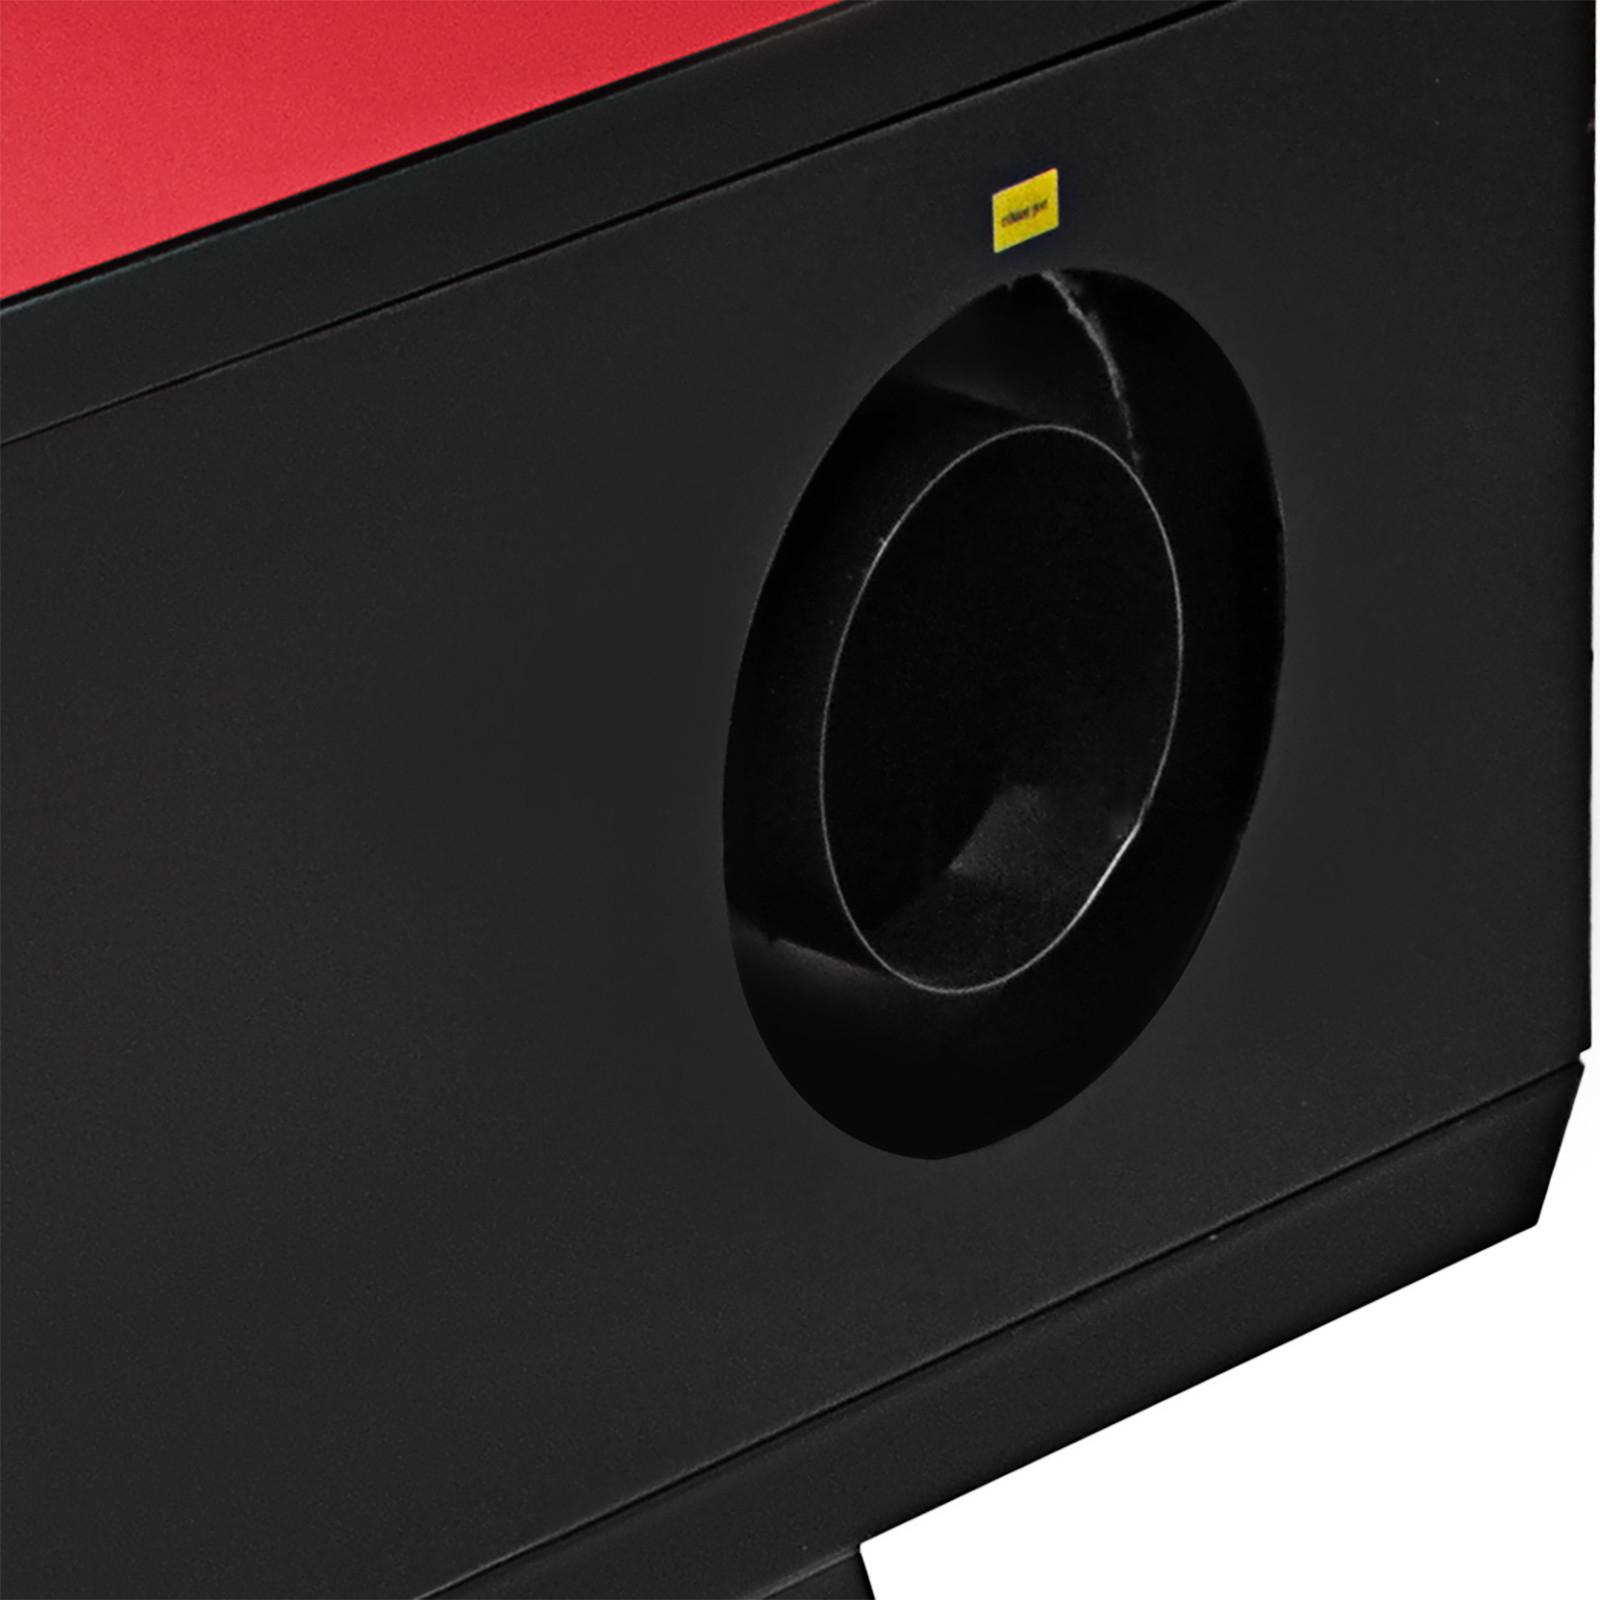 Macchina-per-Incisione-Laser-CO2-40-130W-Asse-Rotante-Tagliatrice-Incisore miniatura 47